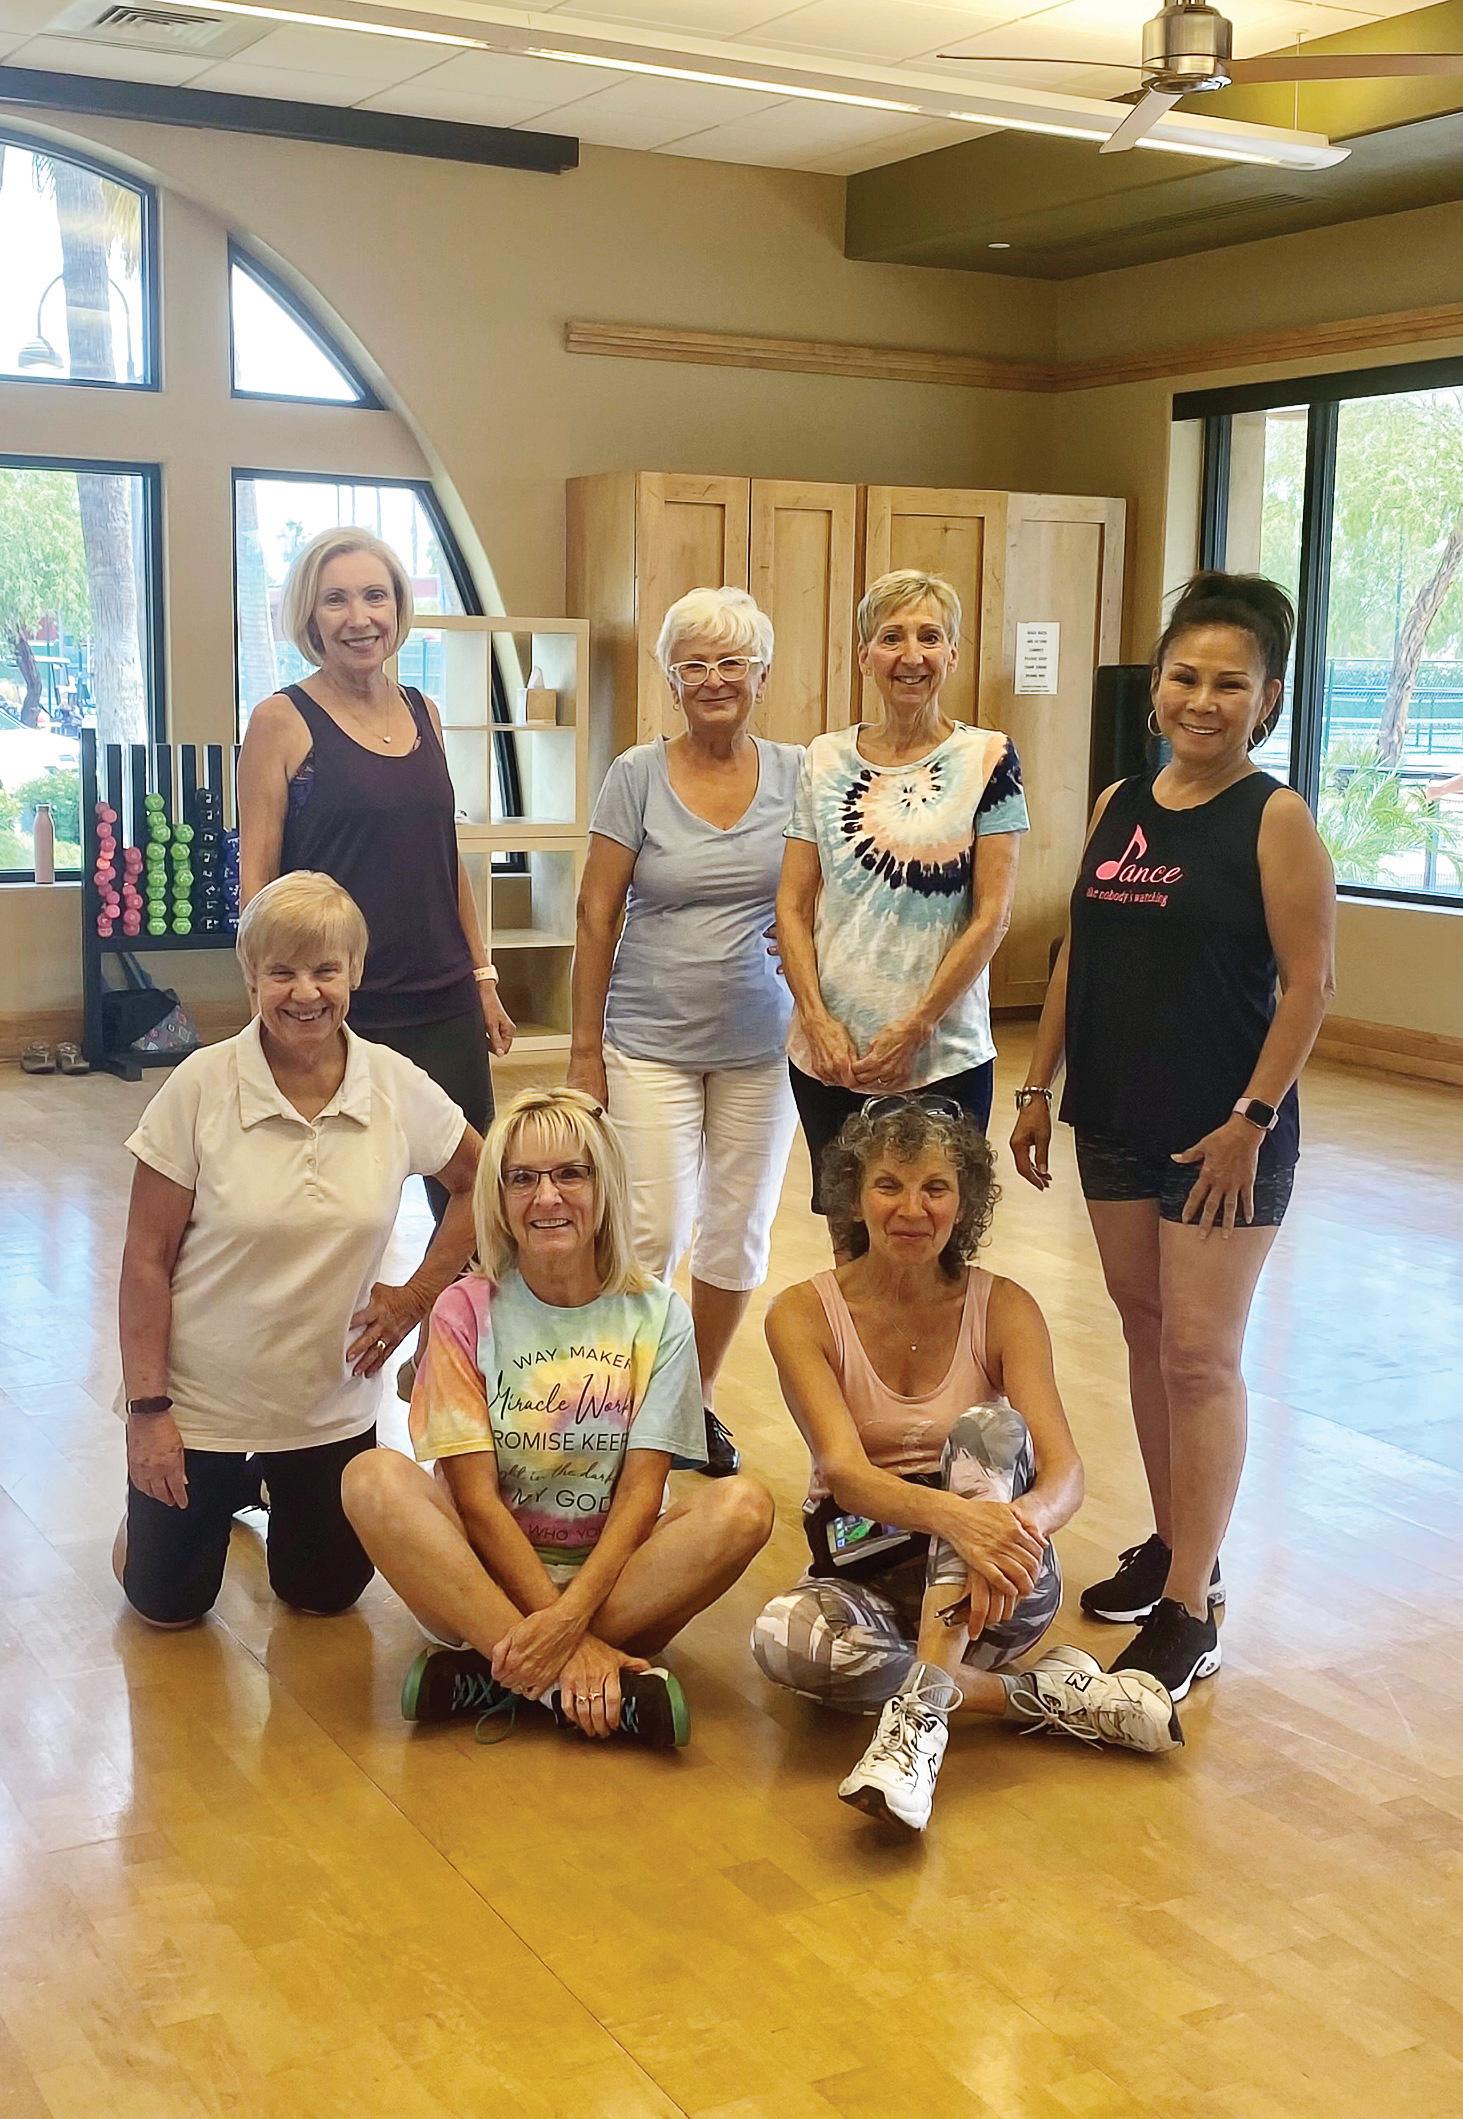 Members of the intermediate dance class